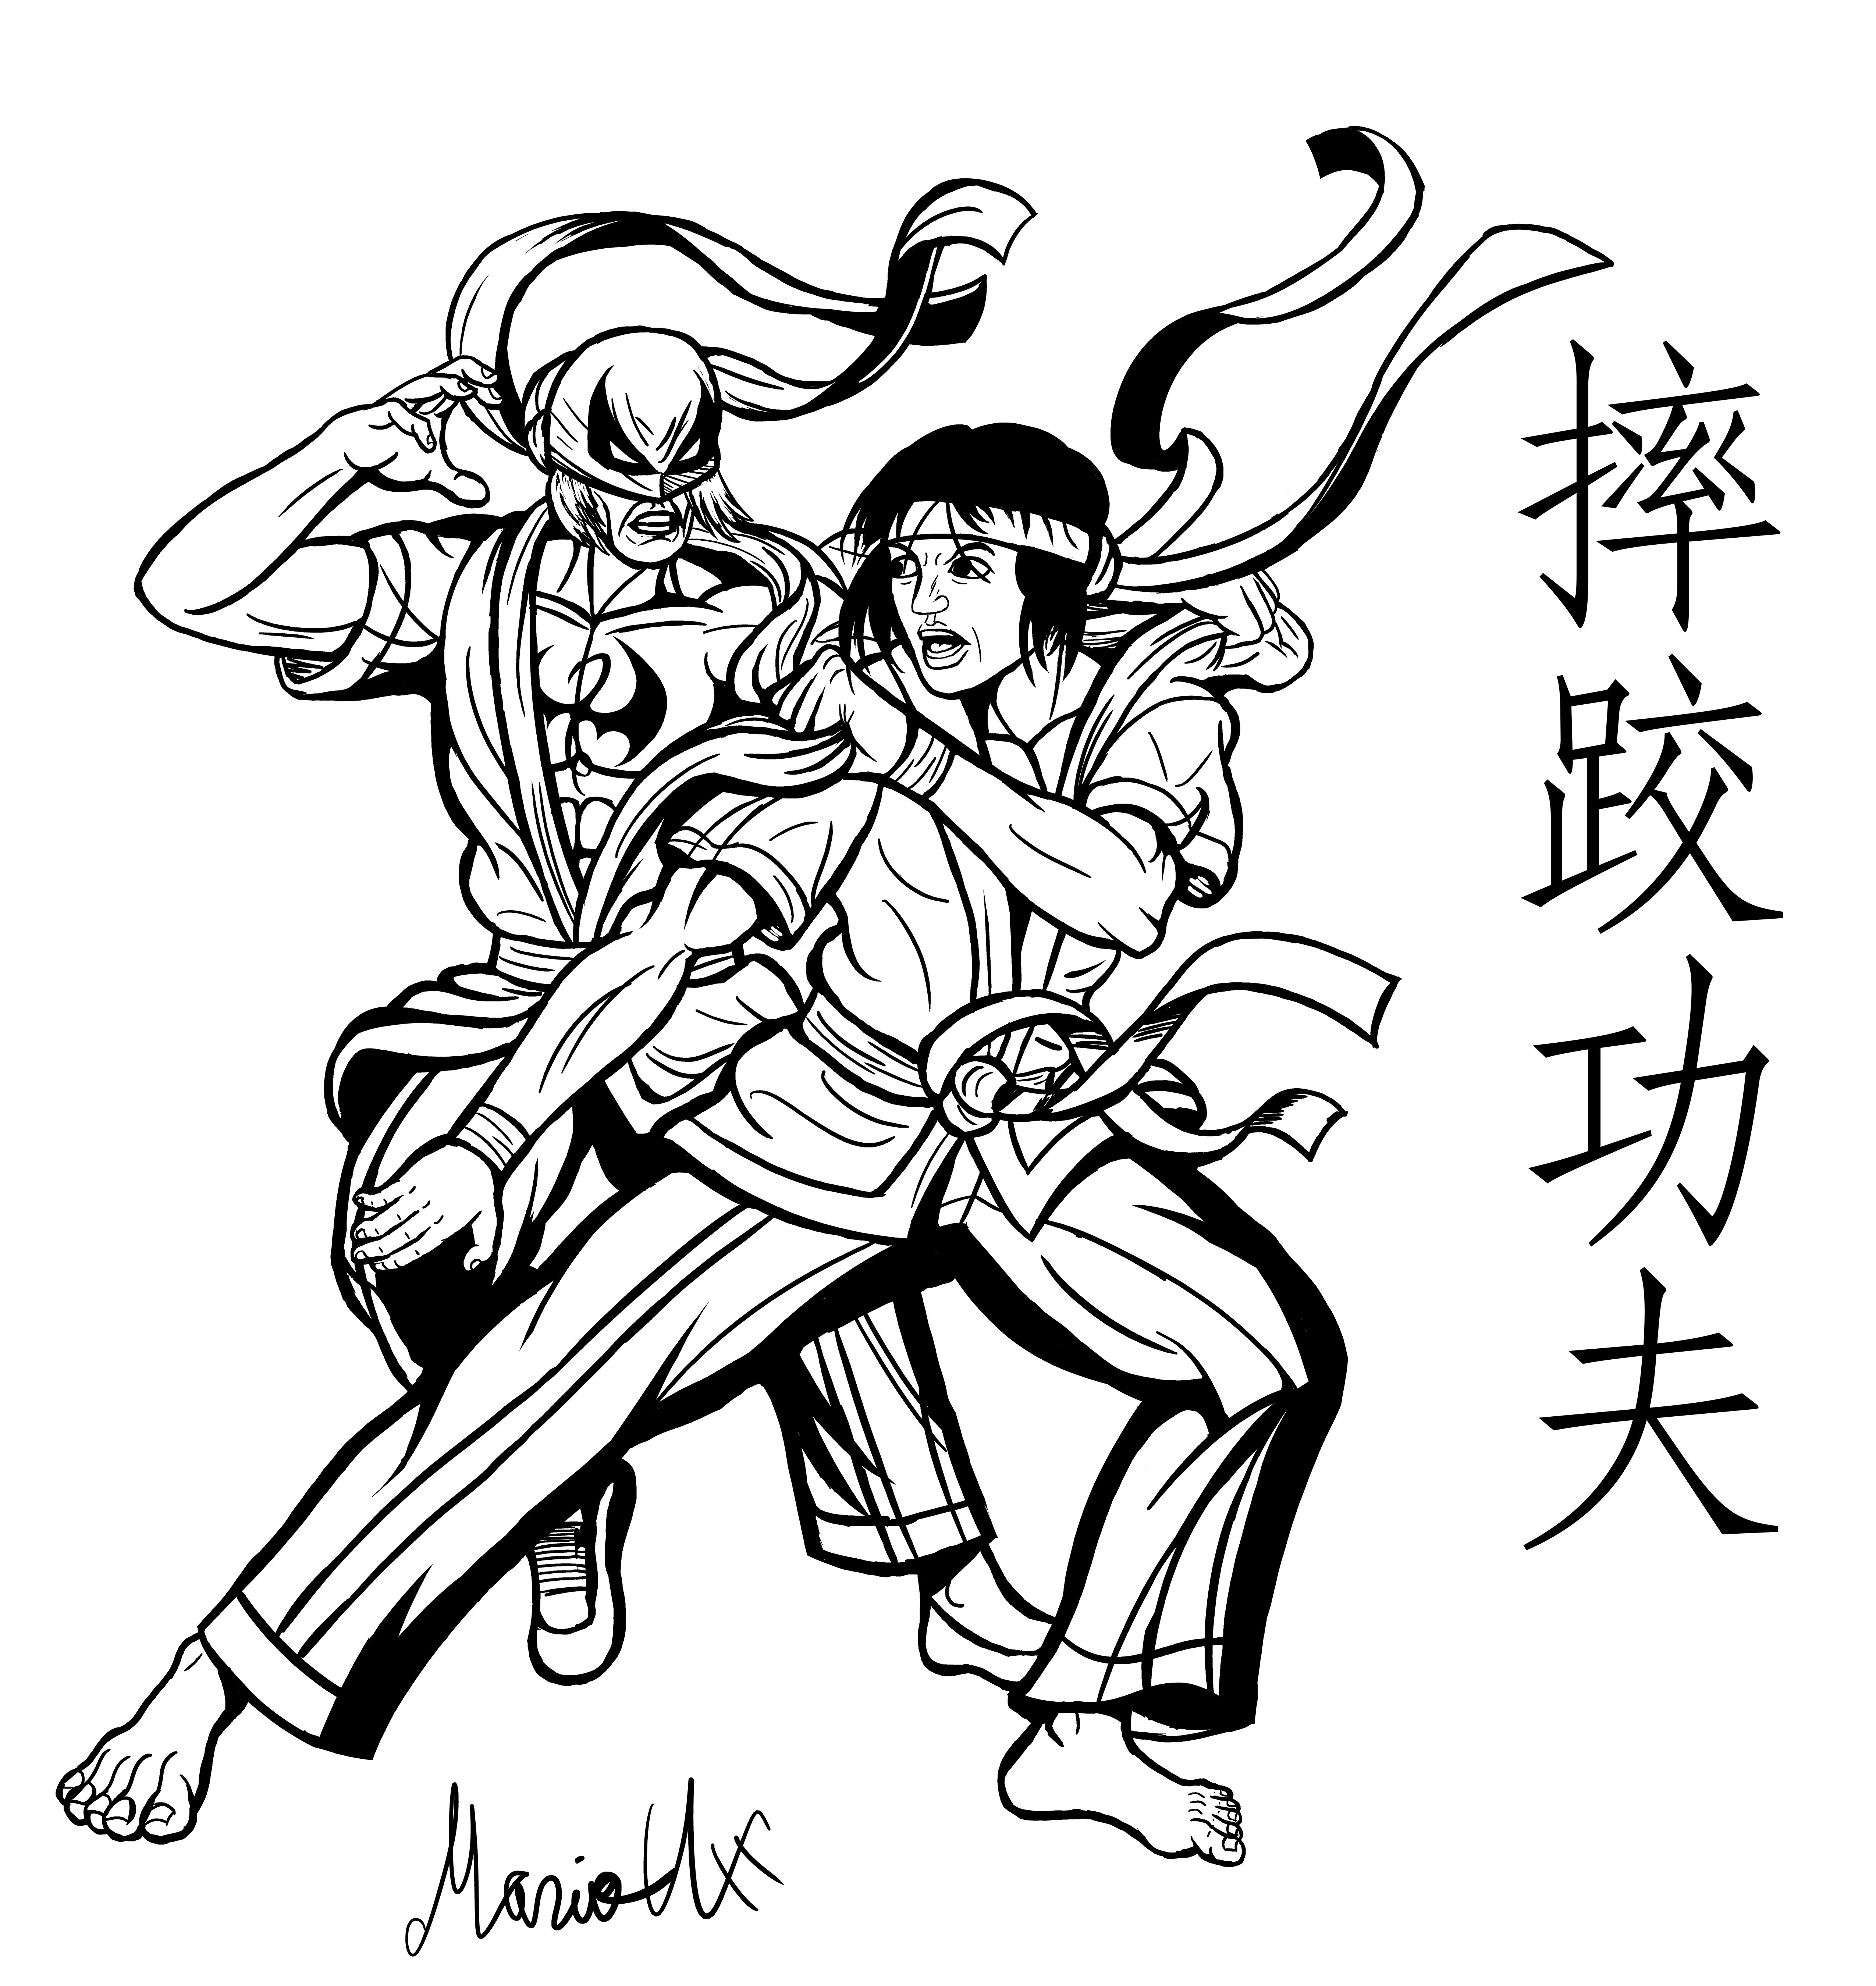 Shuai Jiao Iron Fist and Shang Chi inked